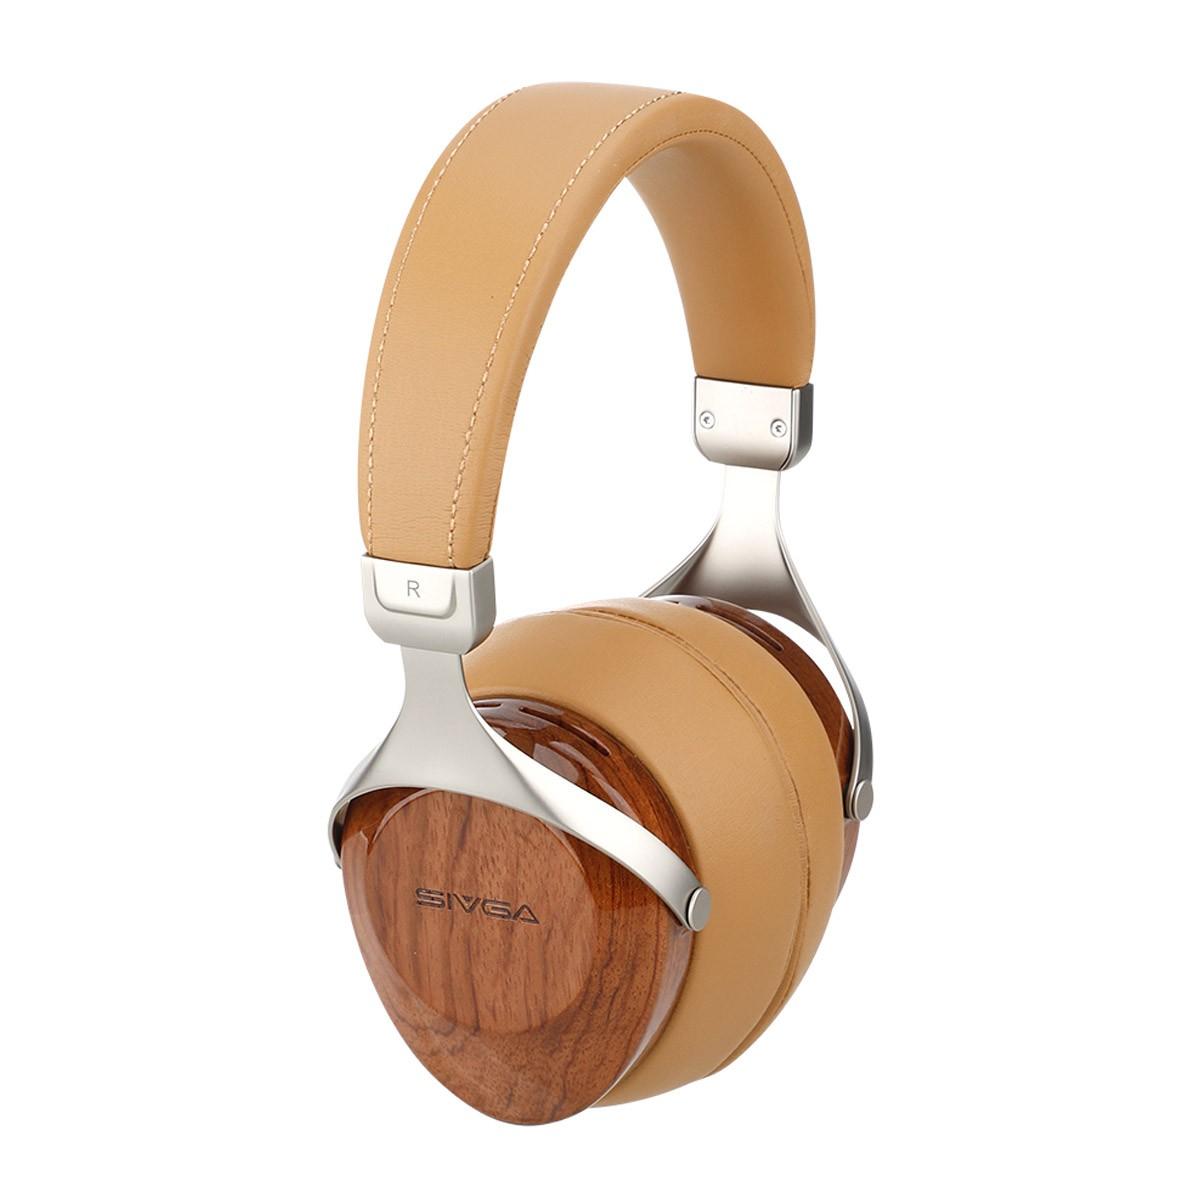 SIVGA ROBIN Dynamic Closed-Back Over-Ear Headphone Ø50mm 32Ω 105dB 20Hz-20kHz Rosewood